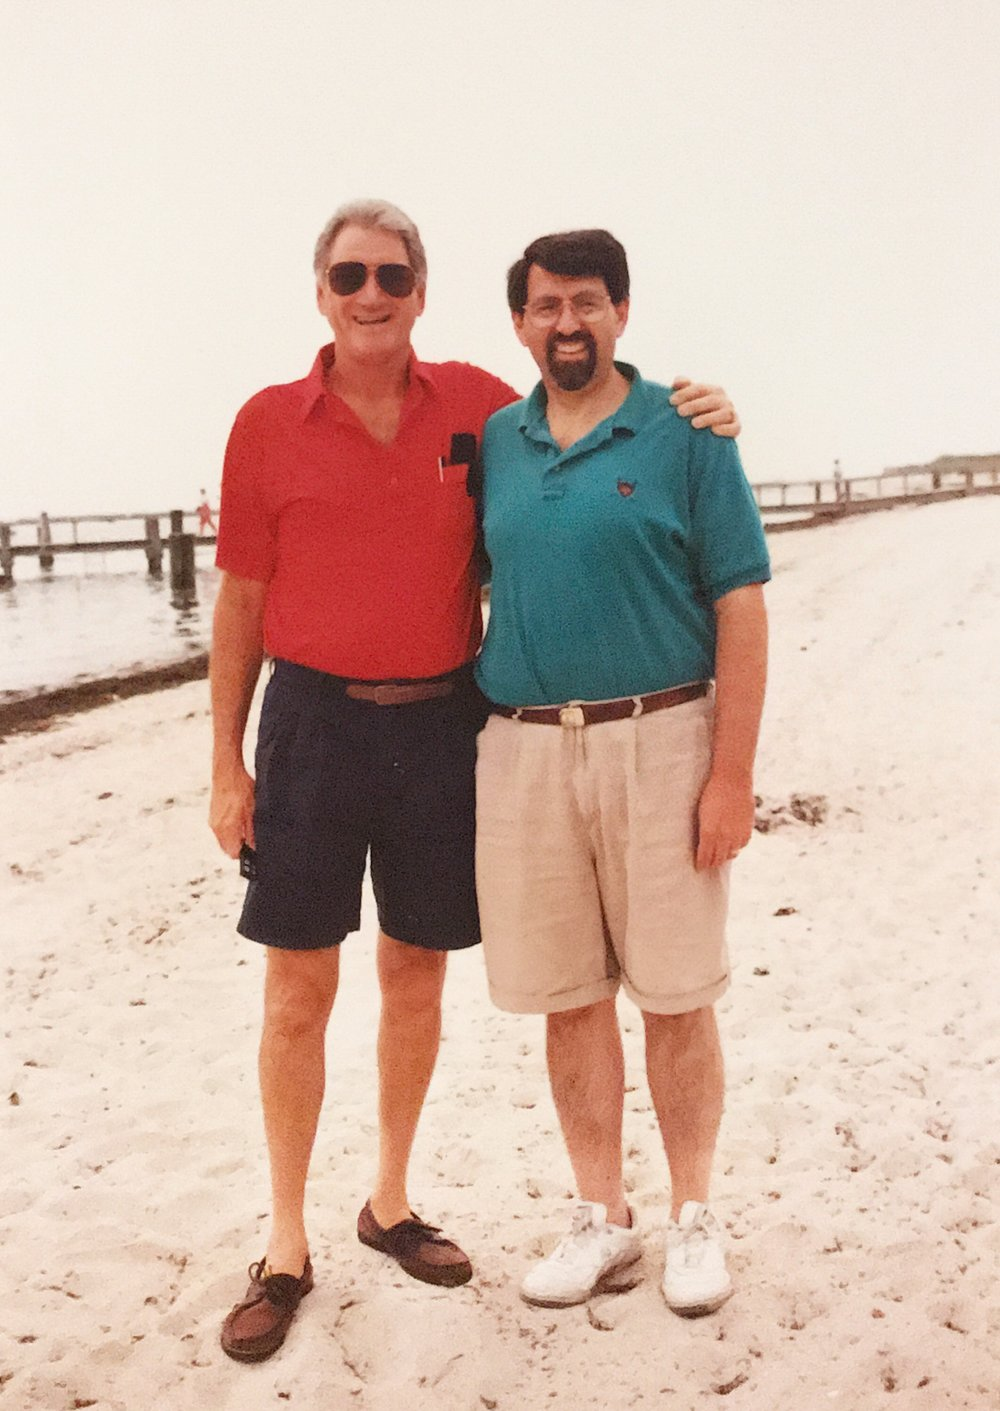 David Nicholas & Dr. James Manganello